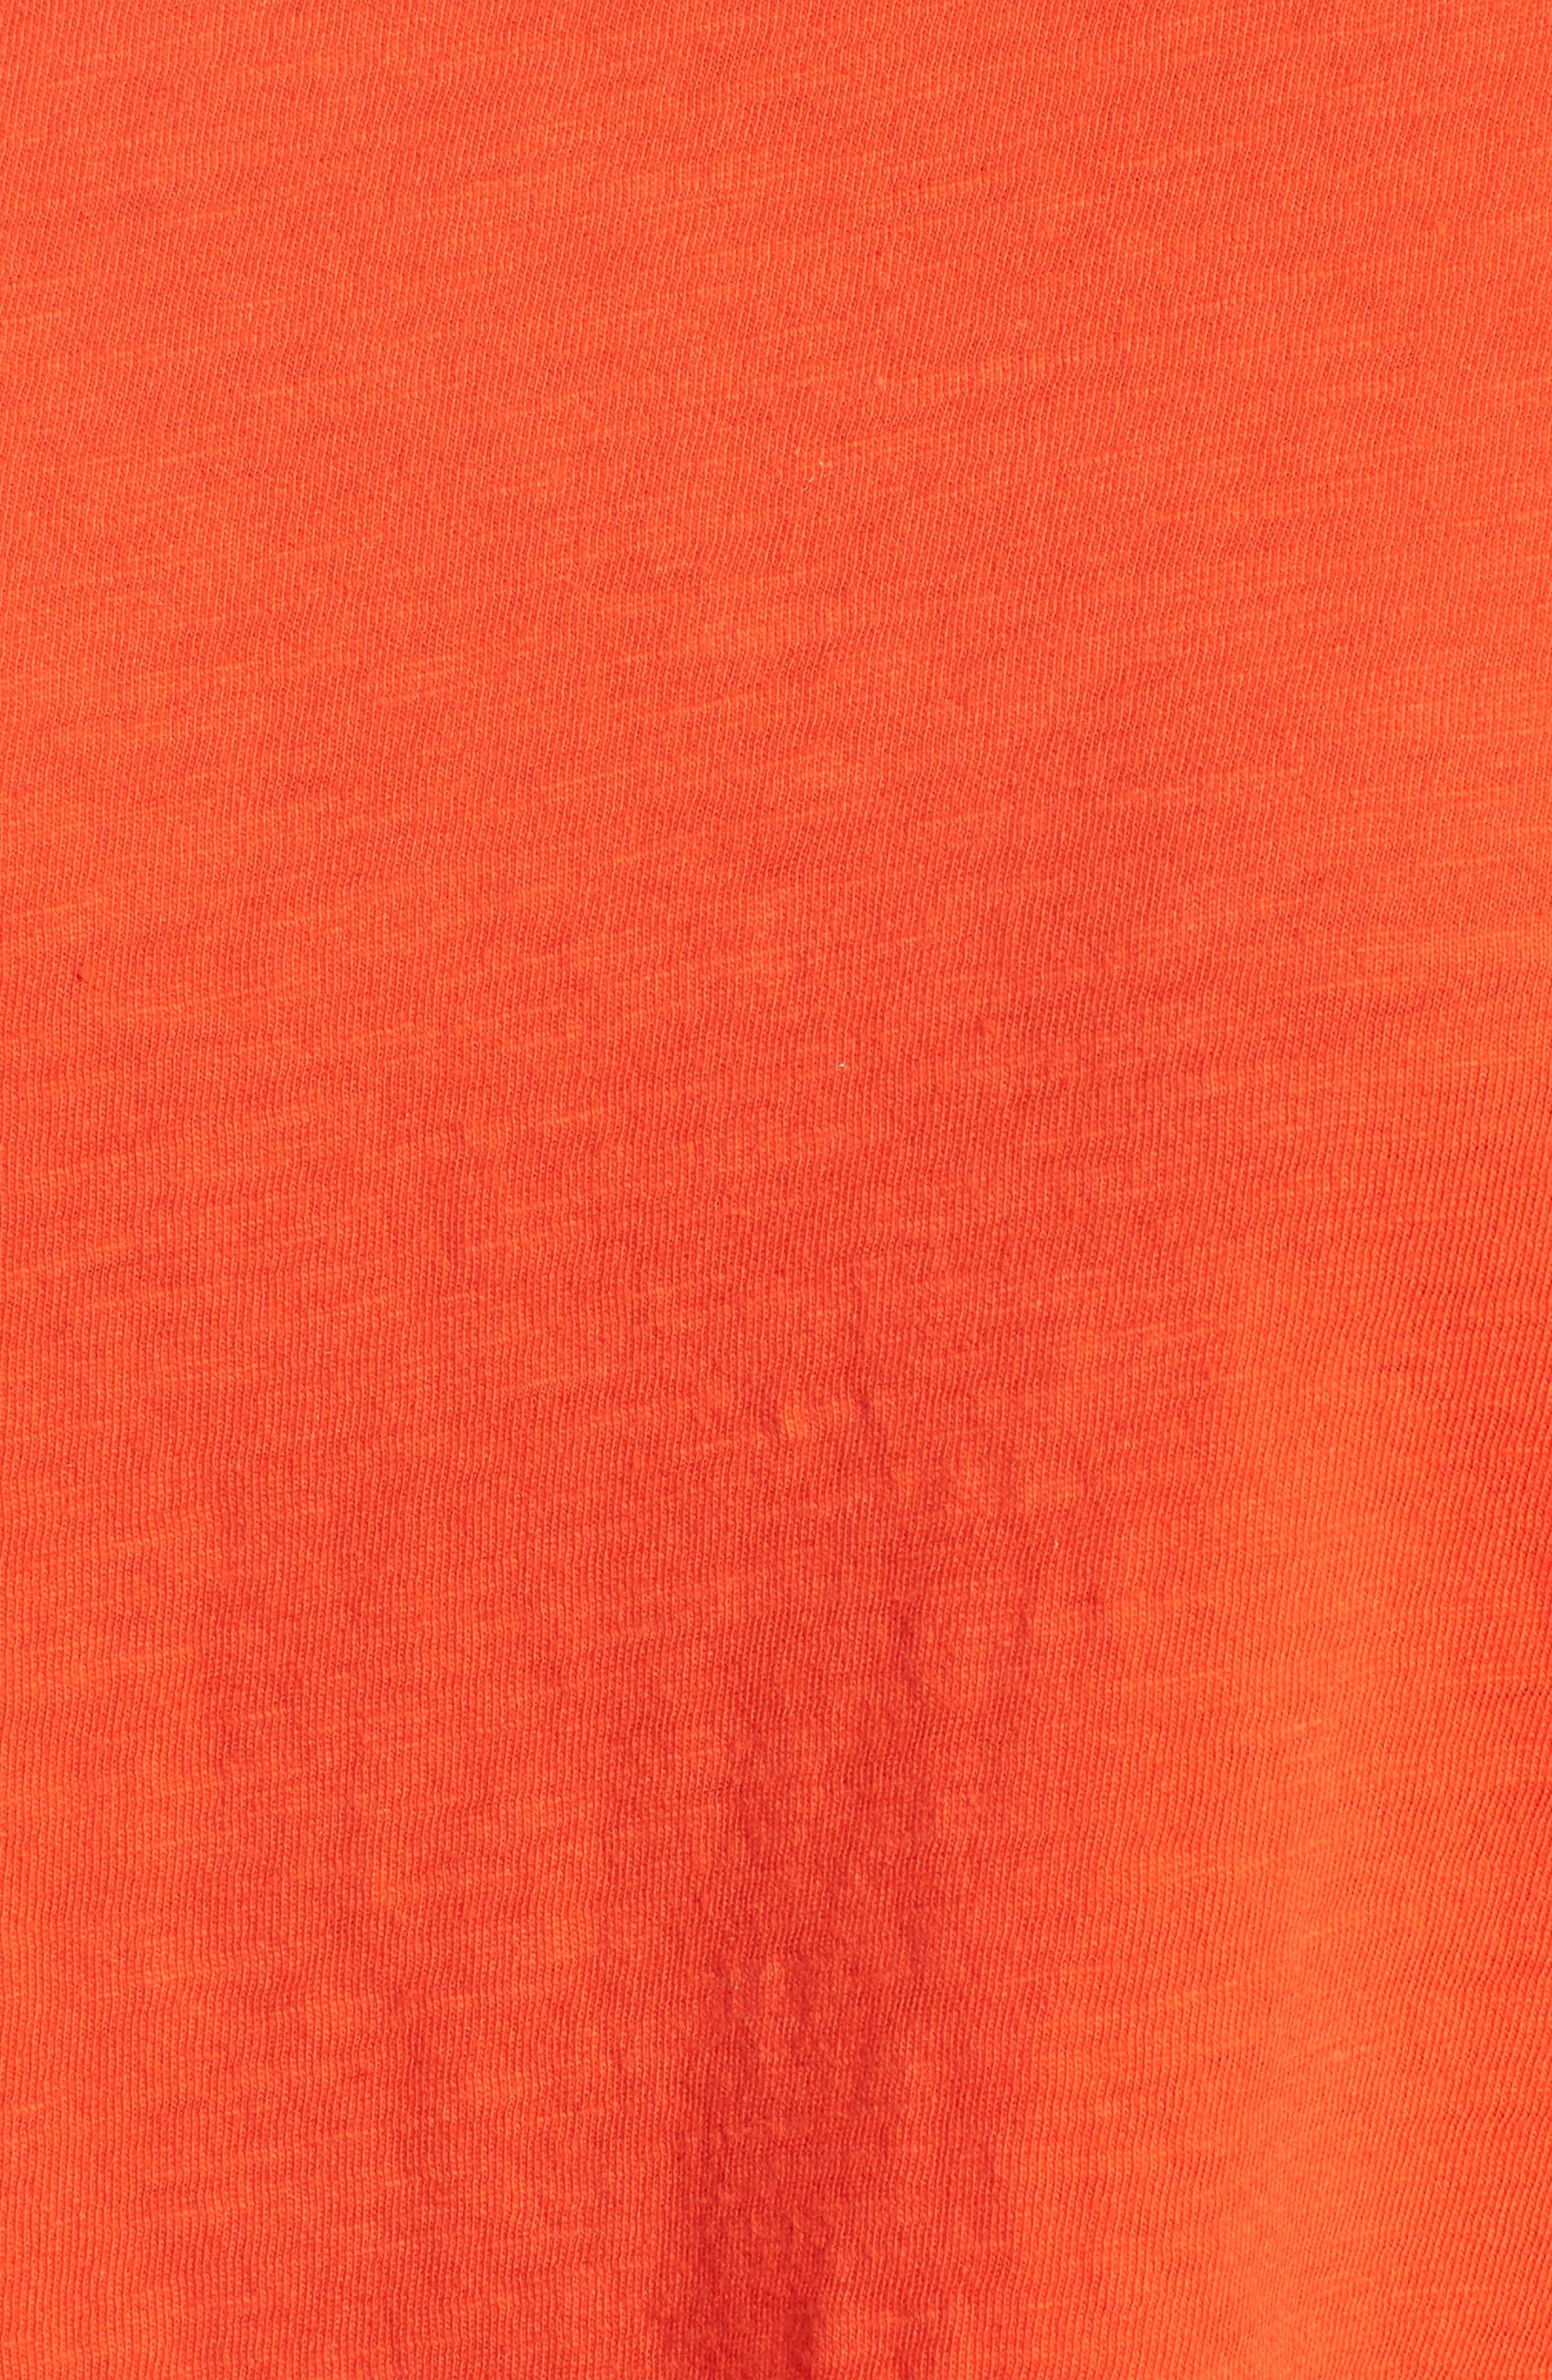 Organic Cotton Knit Top,                             Alternate thumbnail 44, color,